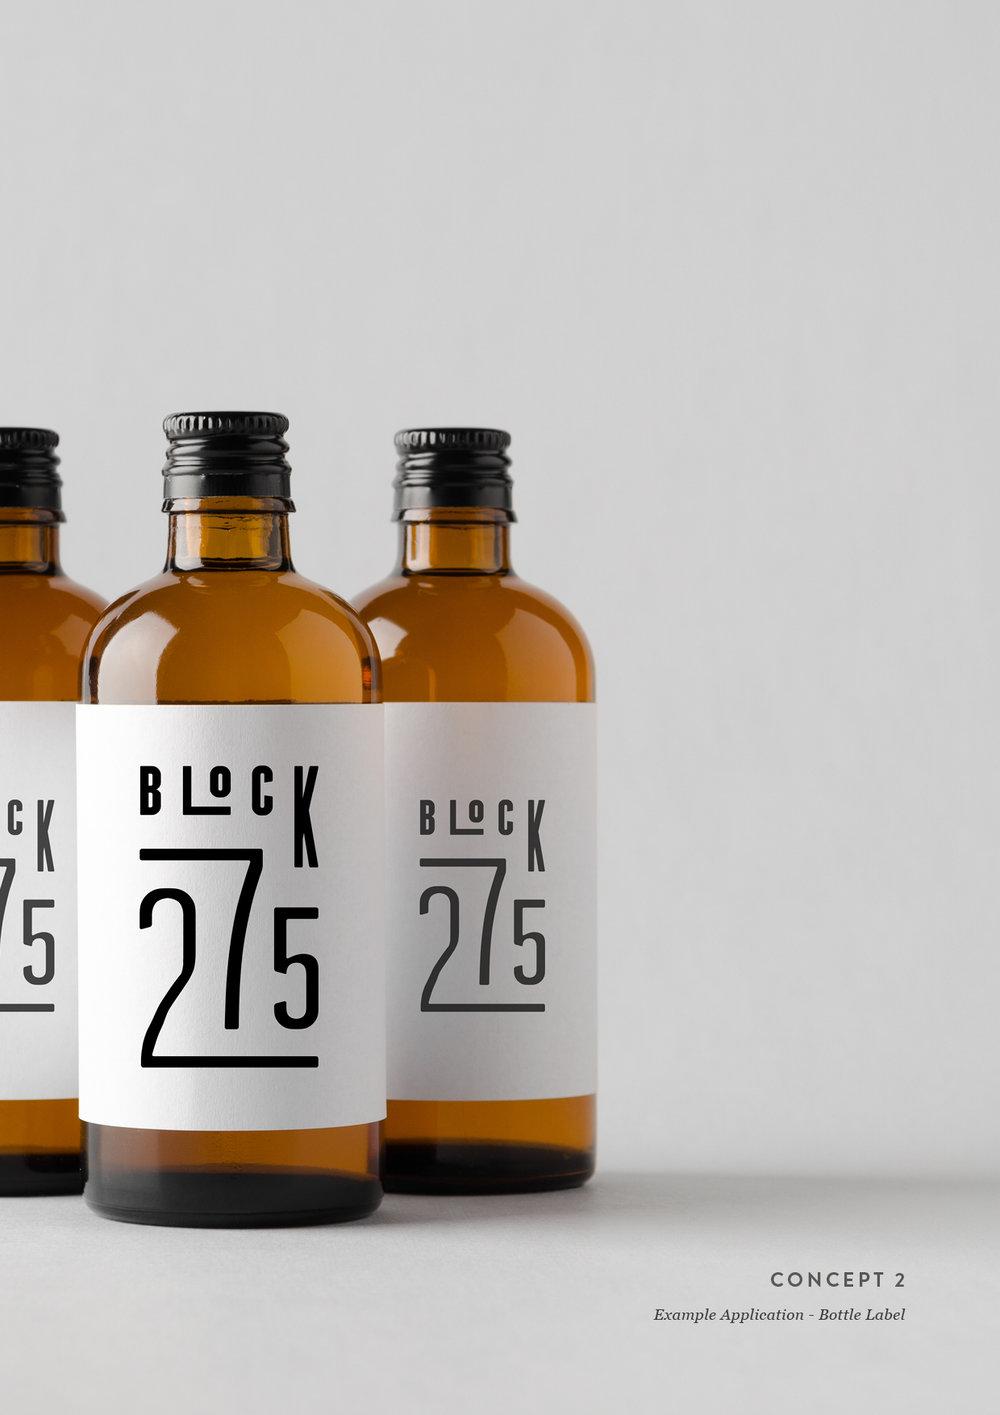 Block 275_Logo Concept 2 - 8.jpg